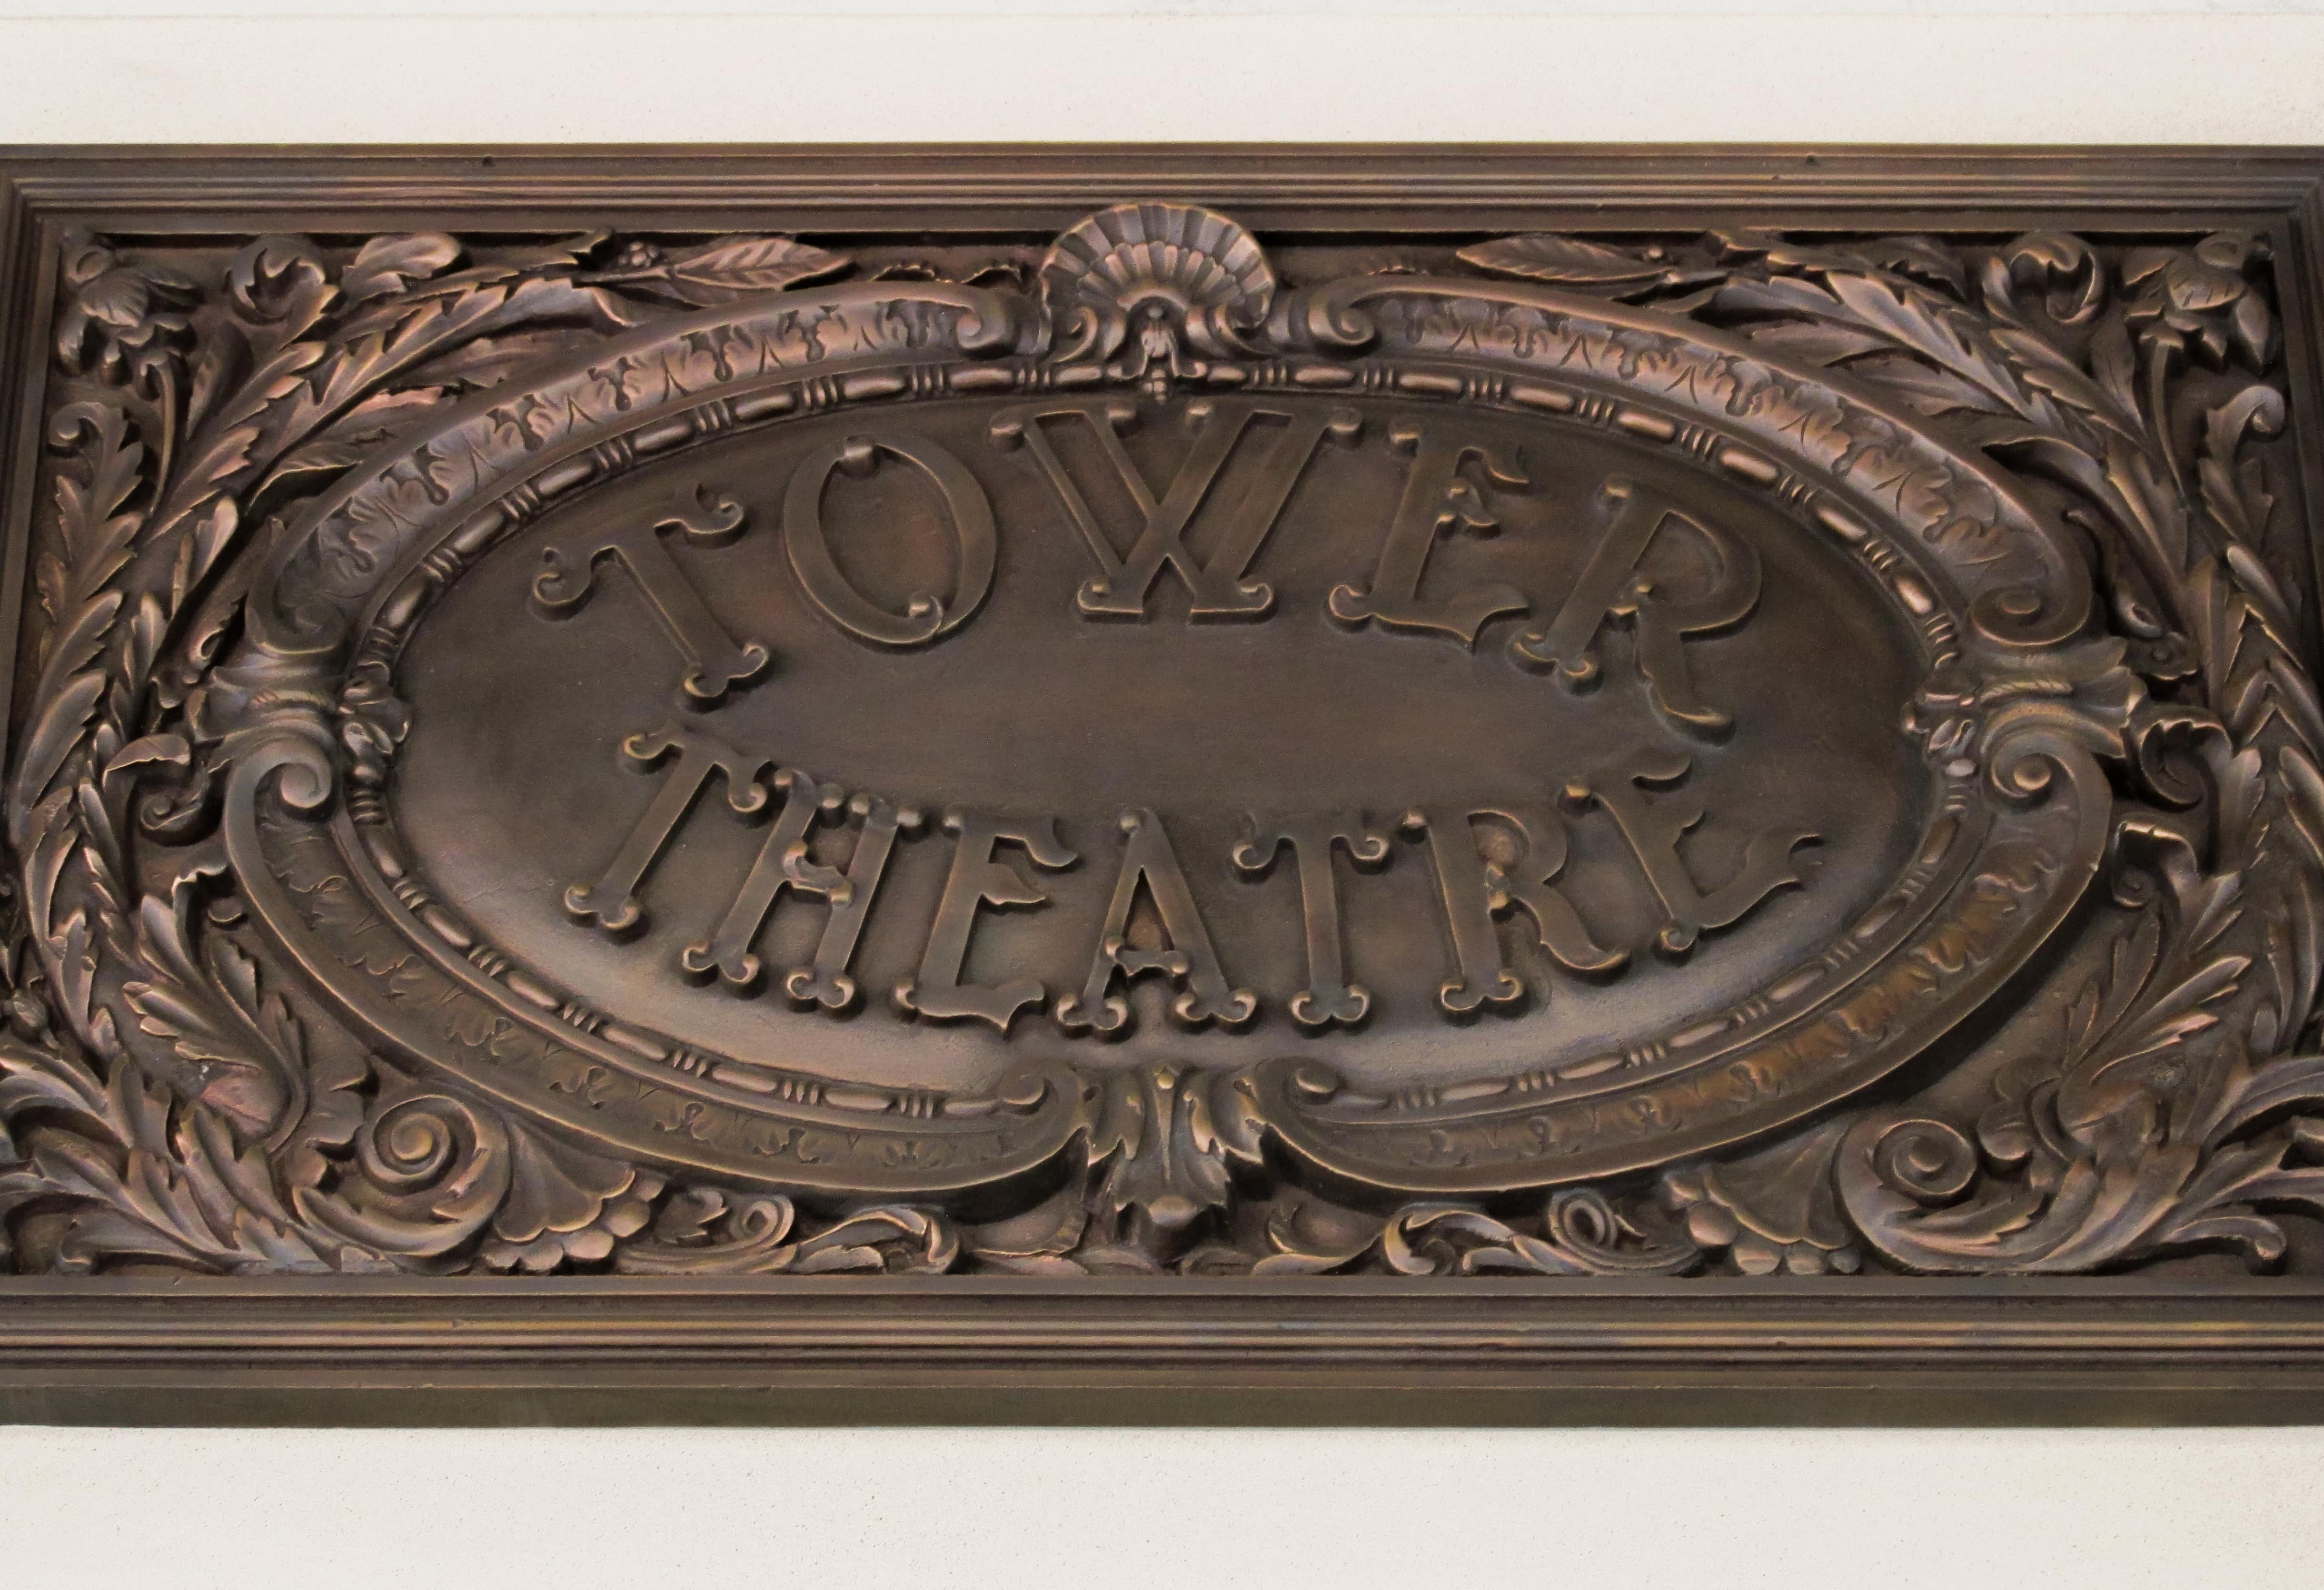 Tower Theatre Bronze Sign